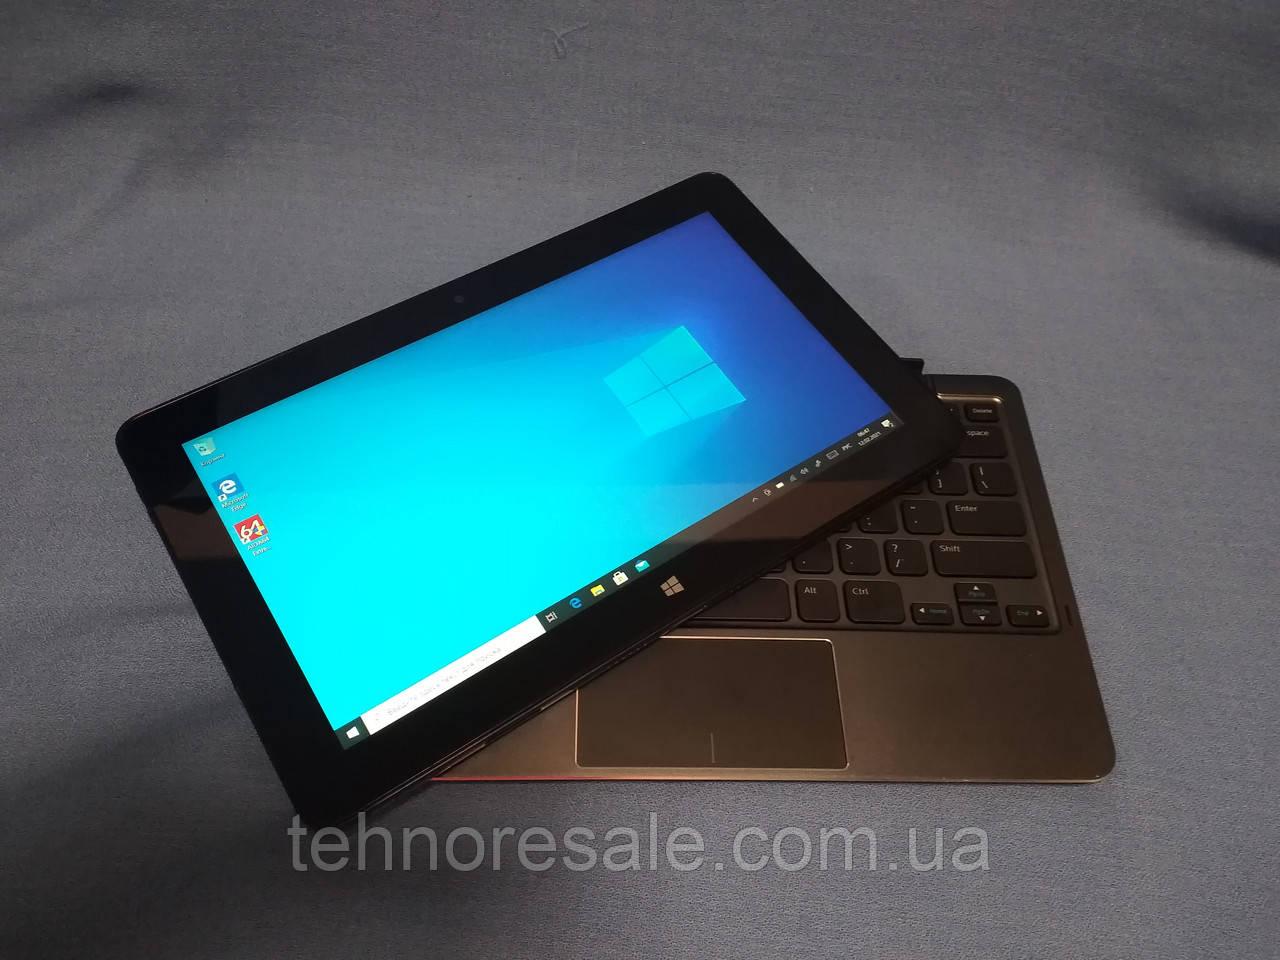 Планшет з клавіатурою Dell Venue 11 Pro 7140, FHD 11'' , Core M-5y71, 4/128Gb, Wi-fi+Bluetooth, NFC